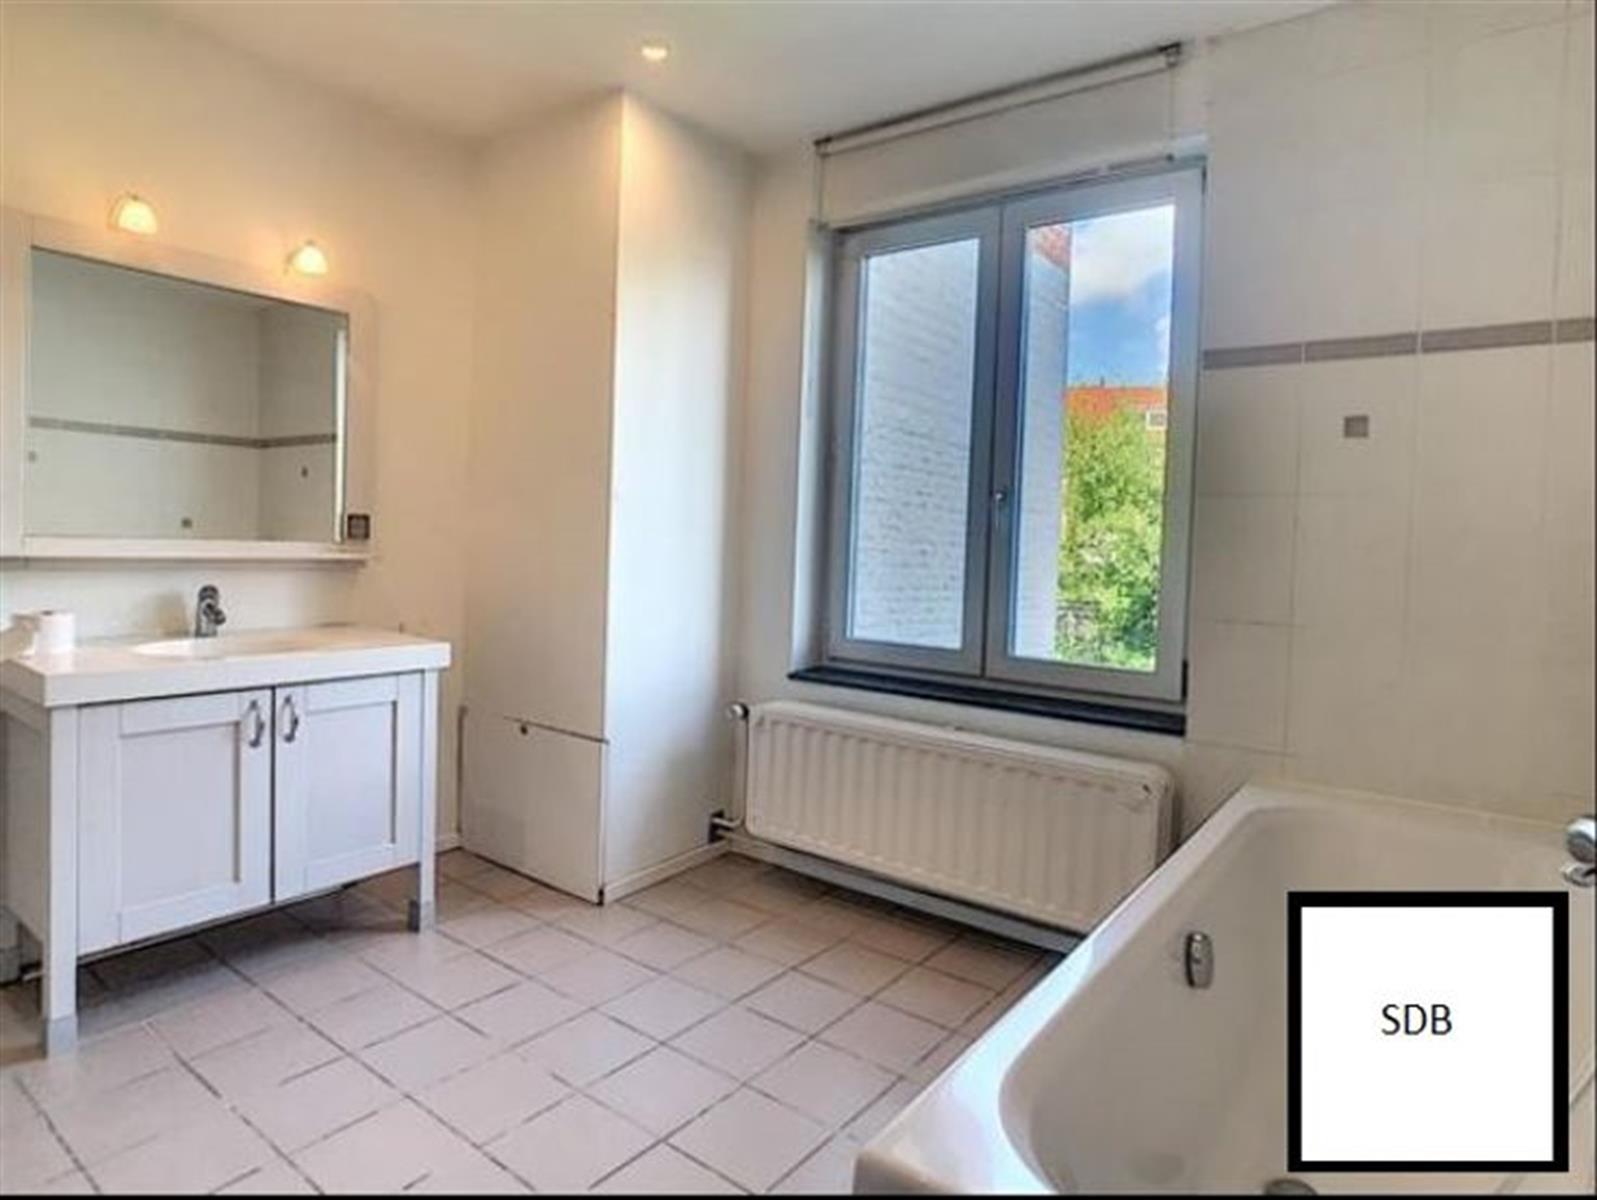 Maison - Auderghem - #4391601-10